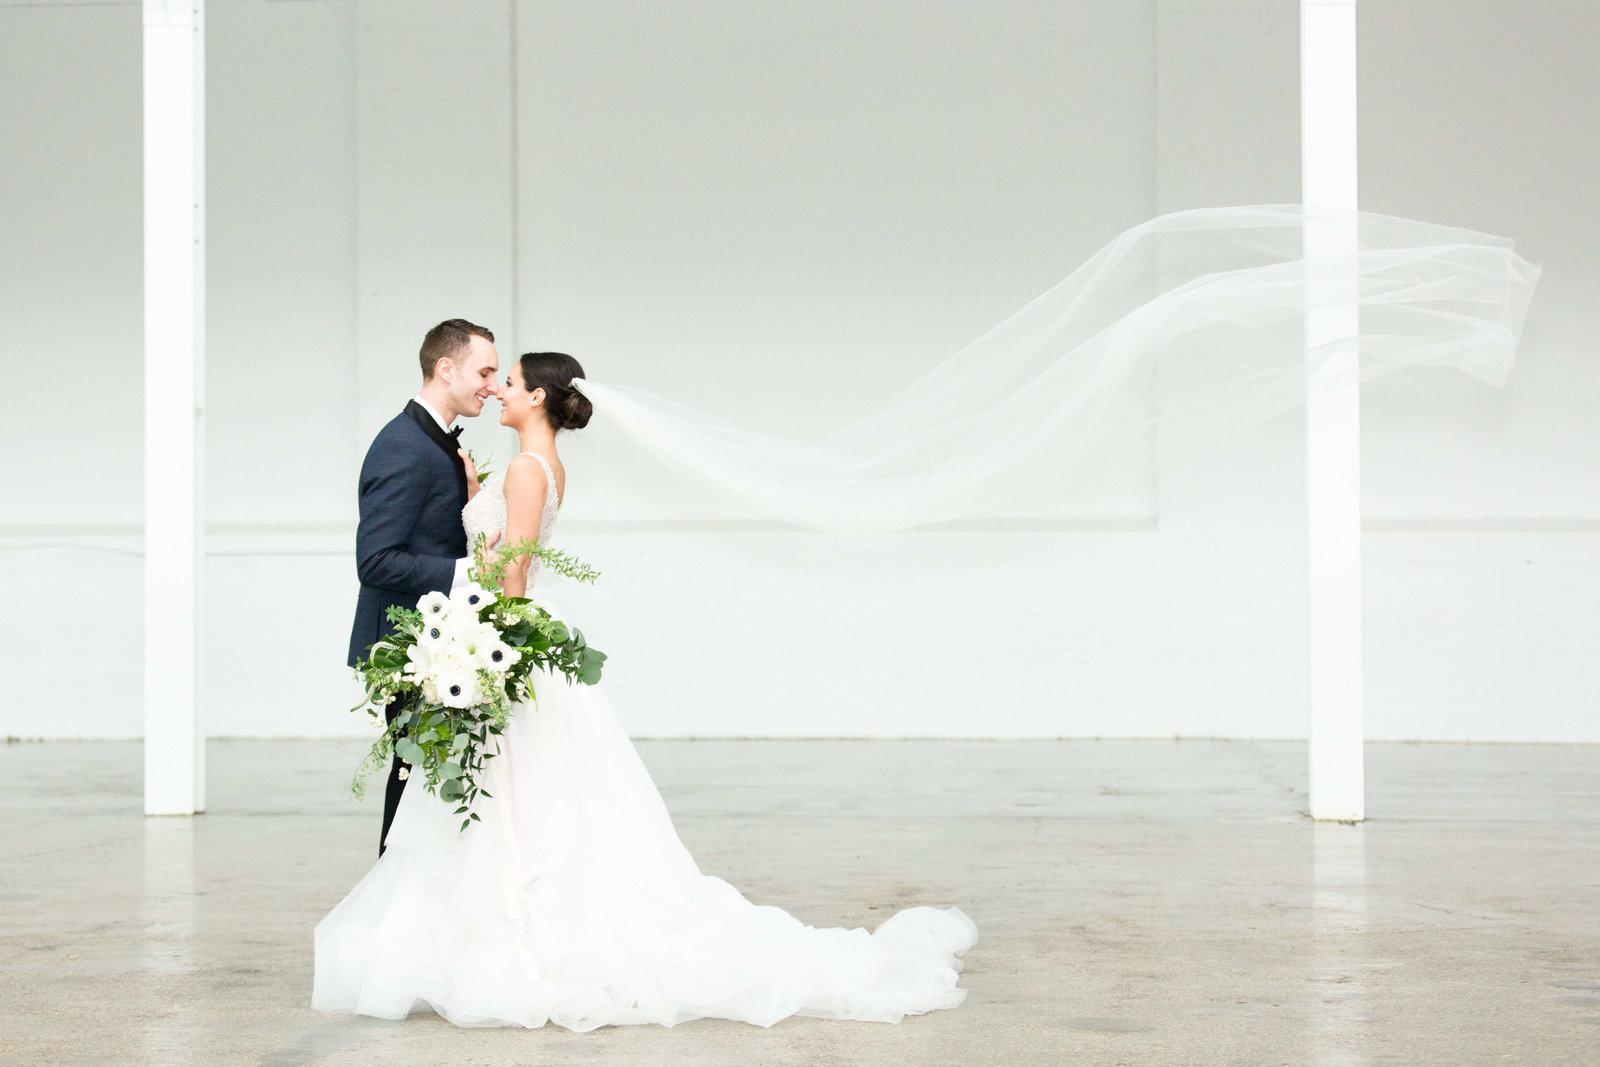 Famous Wedding Reception Venues Akron Ohio Festooning - Wedding Idea ...